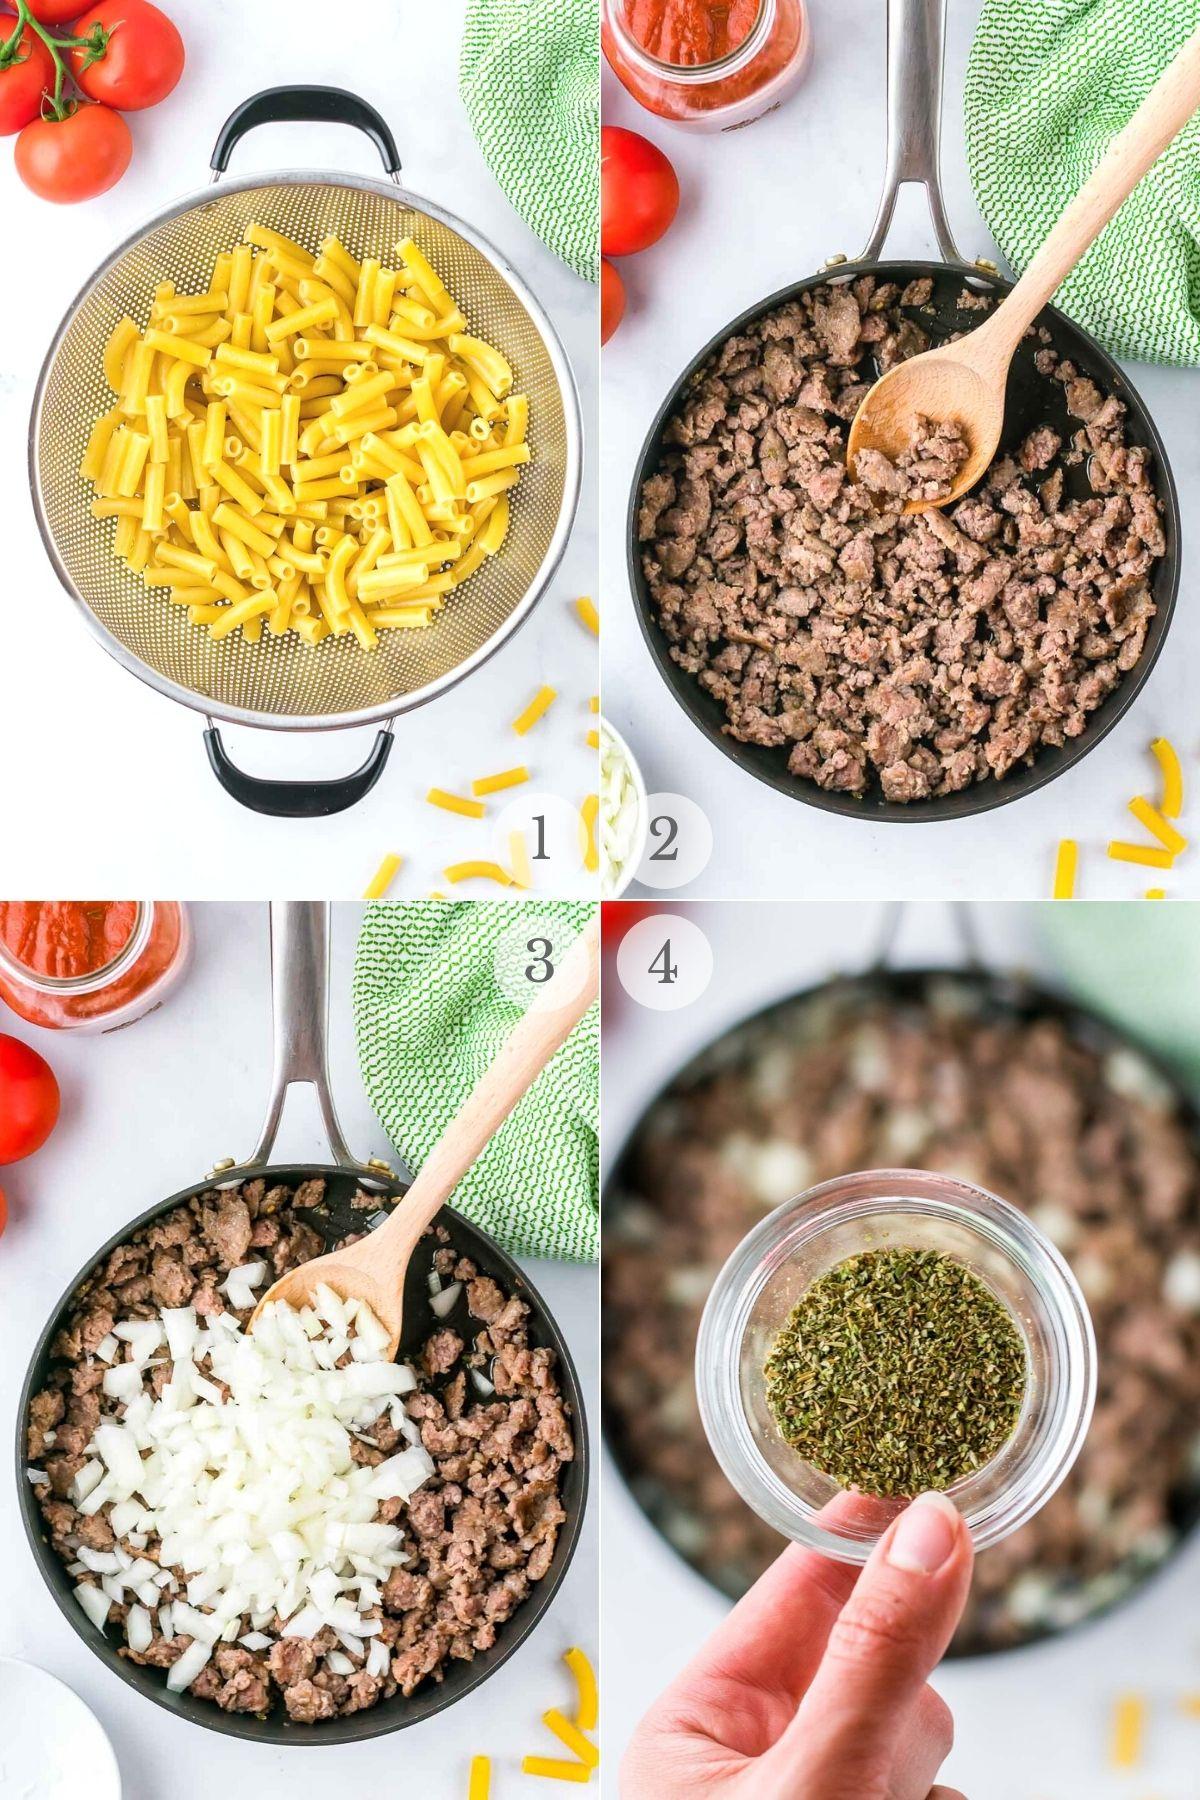 baked ziti recipe steps 1-4